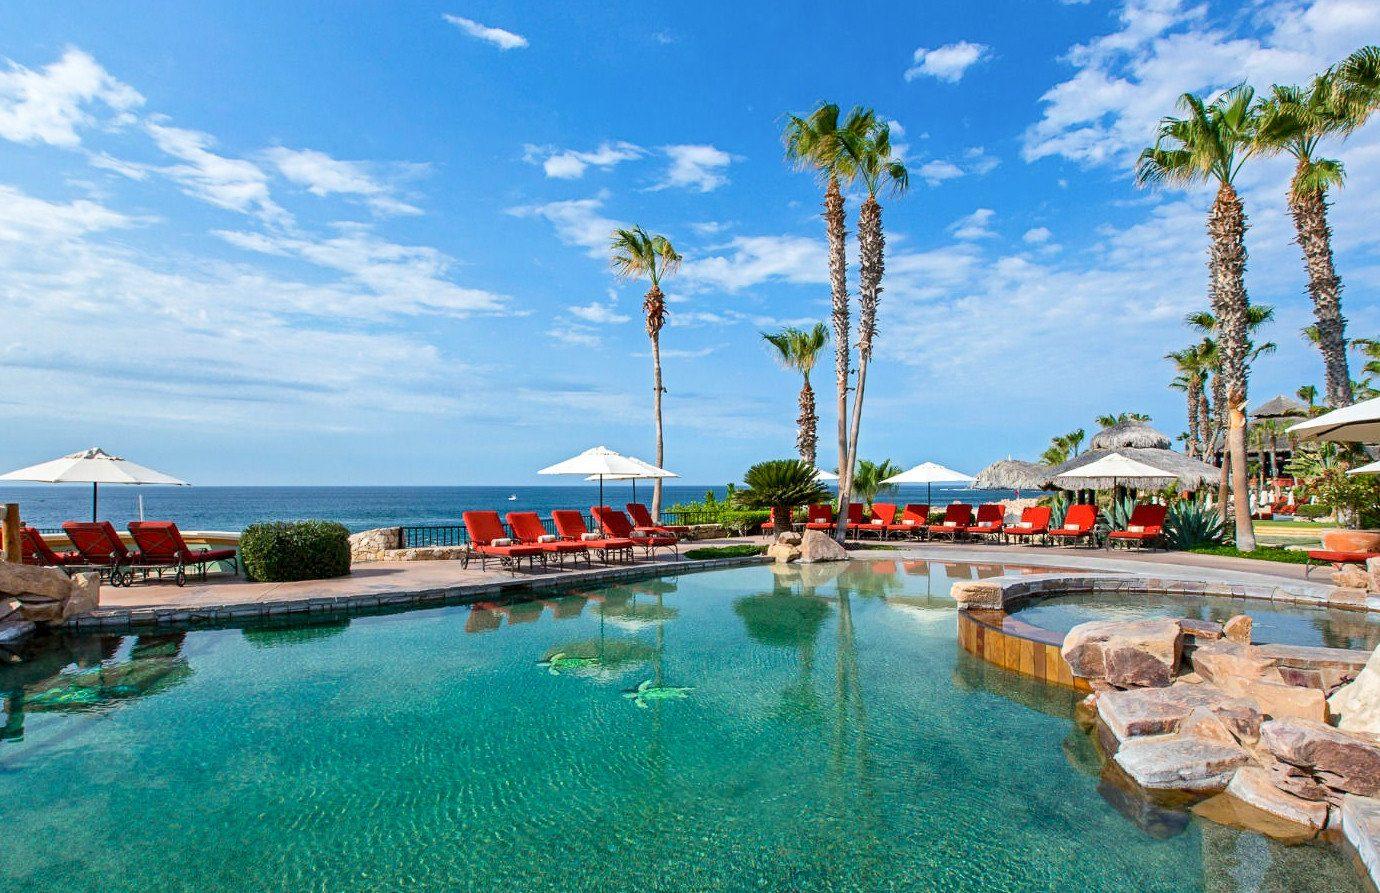 Budget Hotels sky leisure swimming pool outdoor Resort vacation Water park estate resort town amusement park bay Lagoon caribbean marina Sea